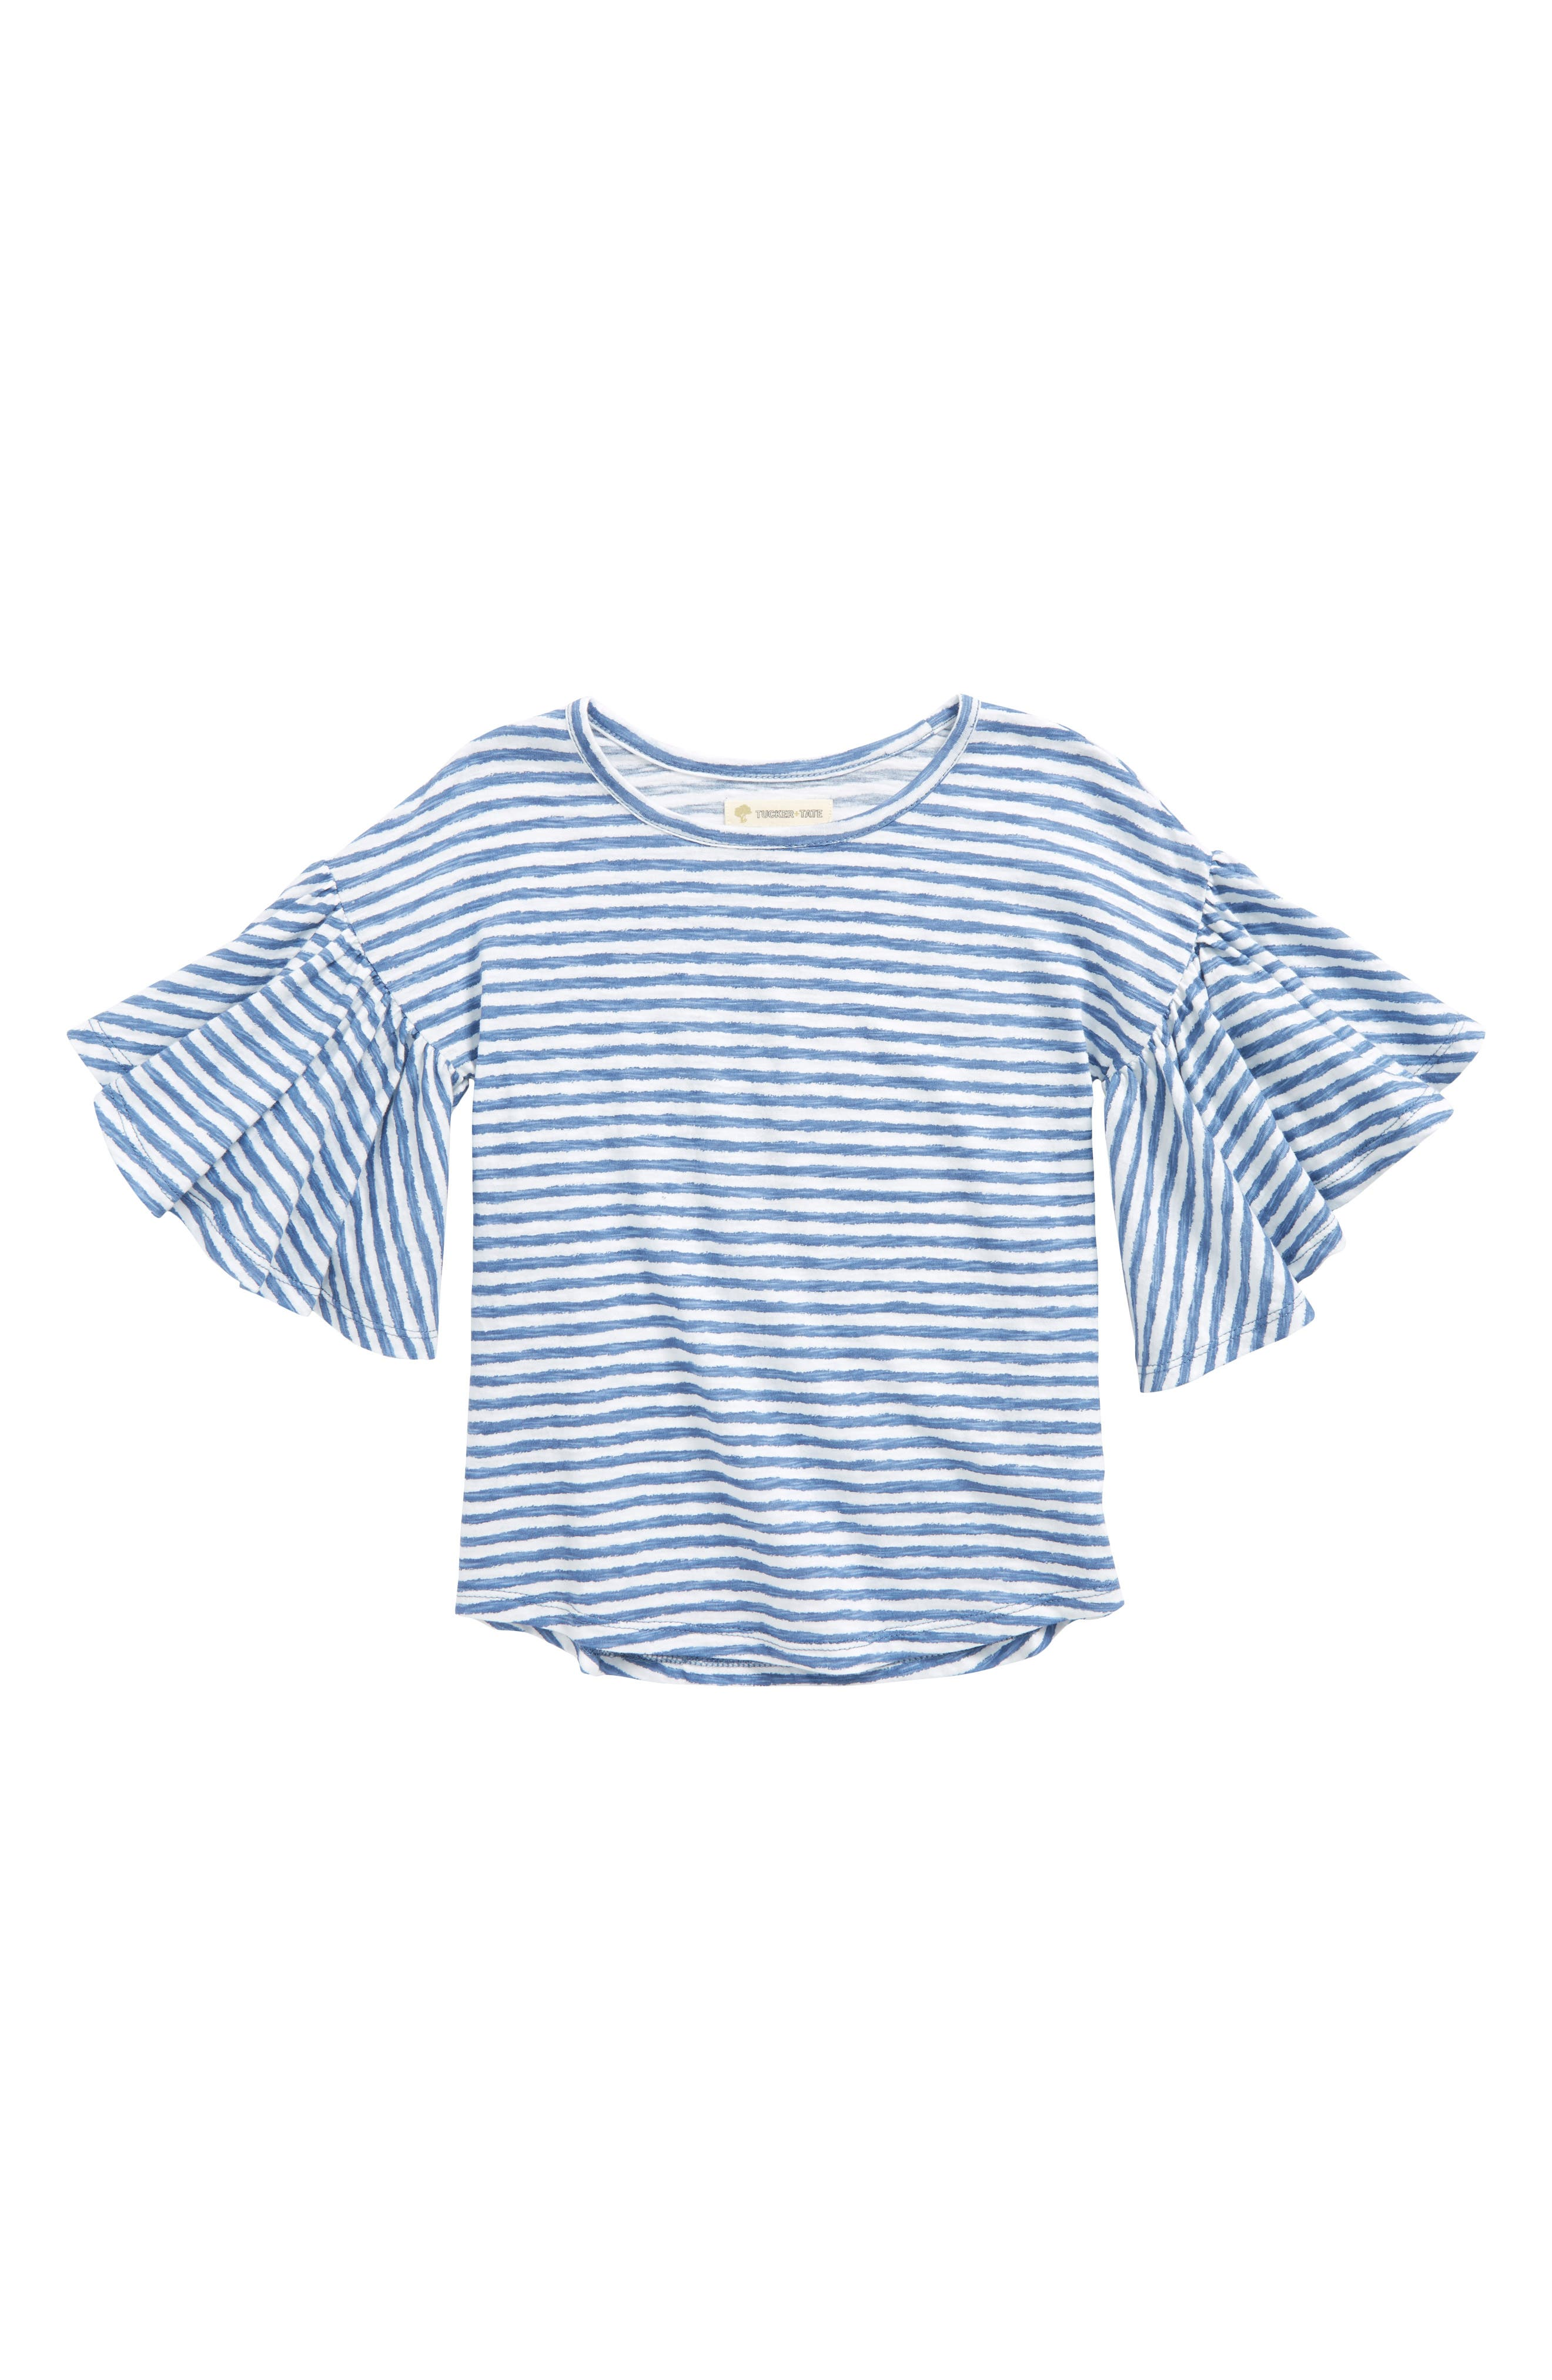 Ruffle Sleeve Top,                         Main,                         color, White- Blue Stripe